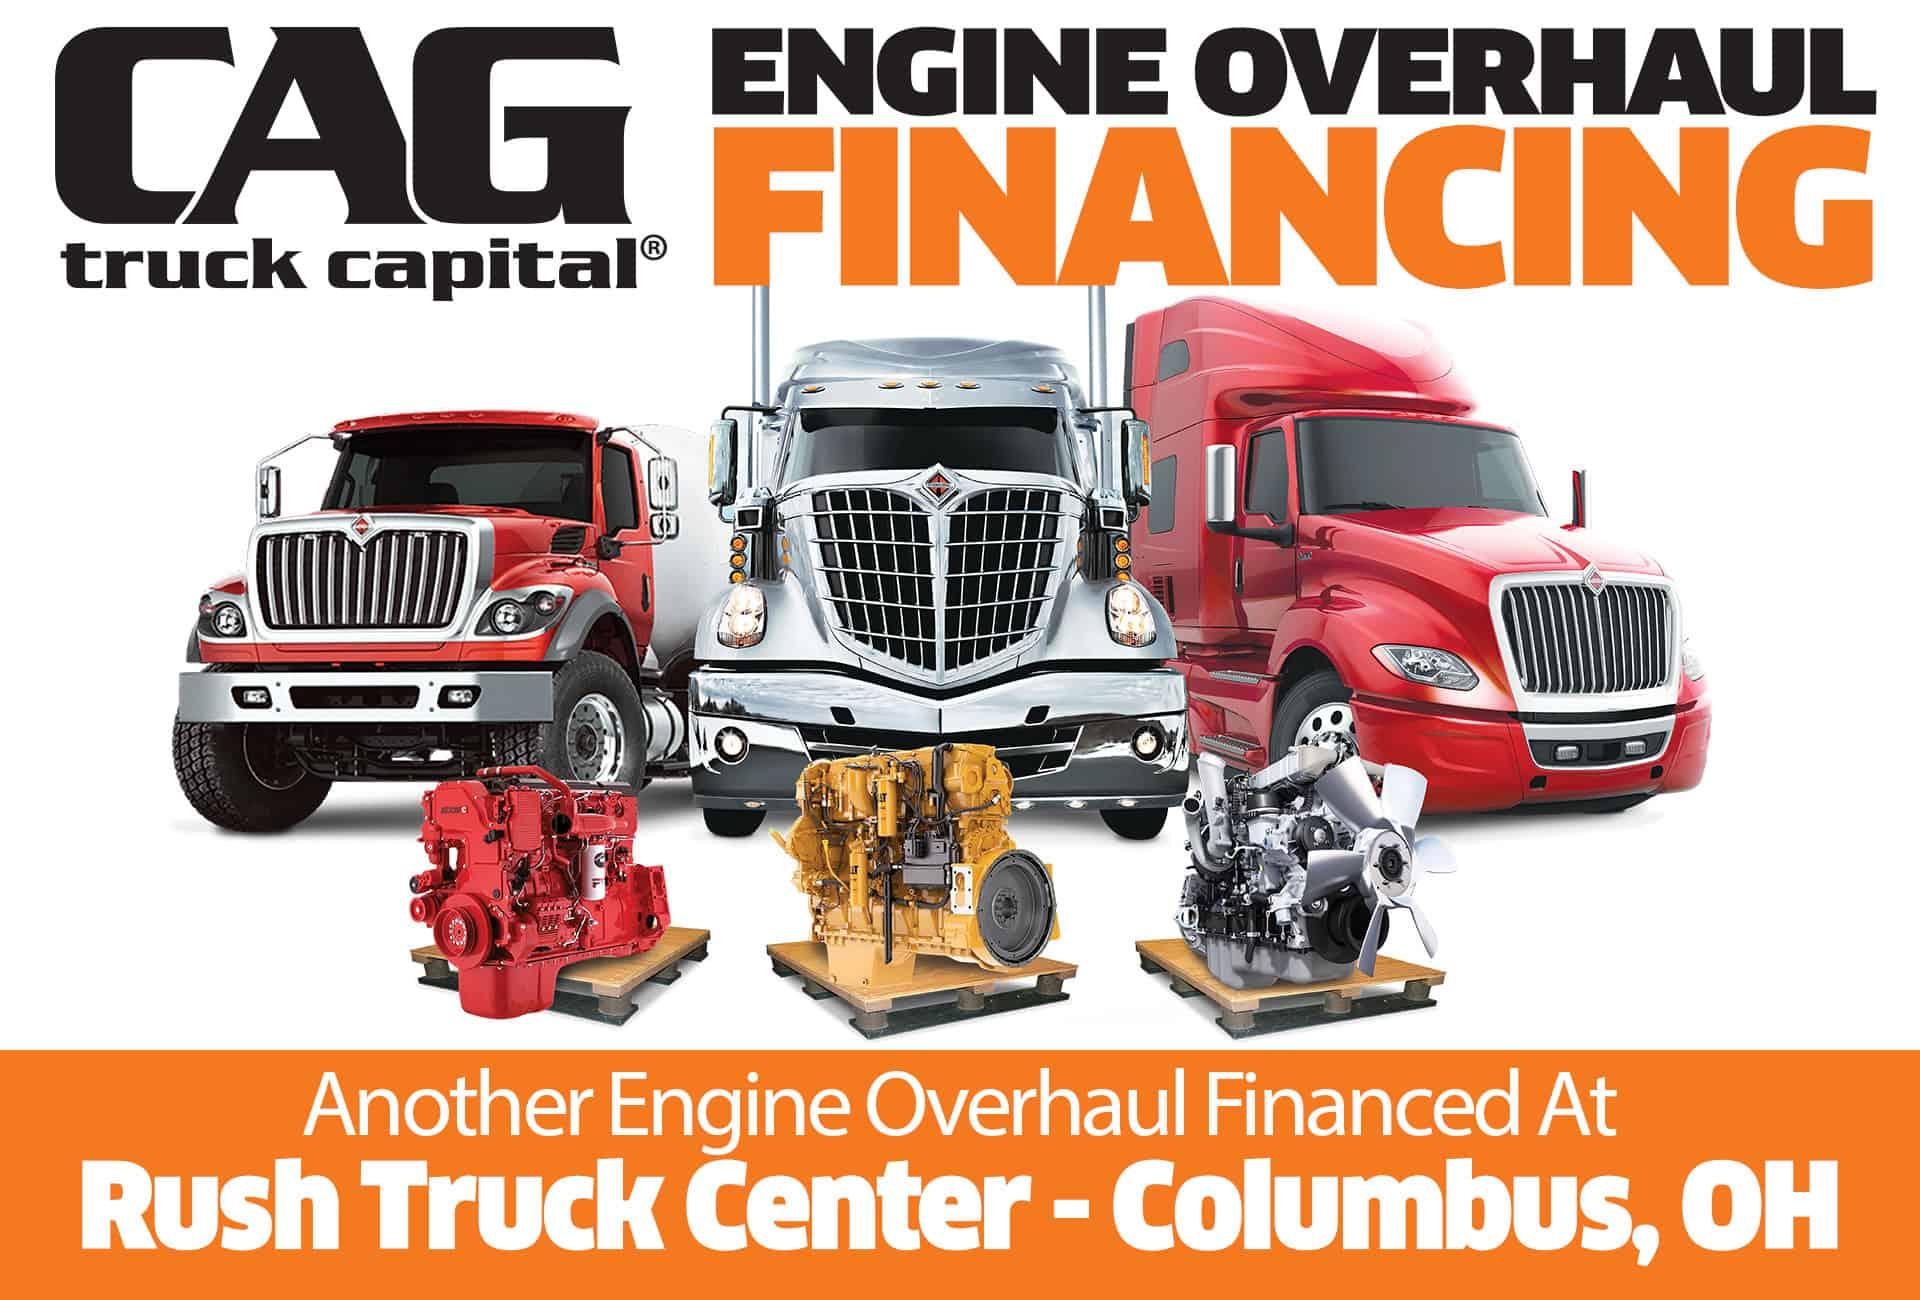 Rush Truck Center Columbus OH